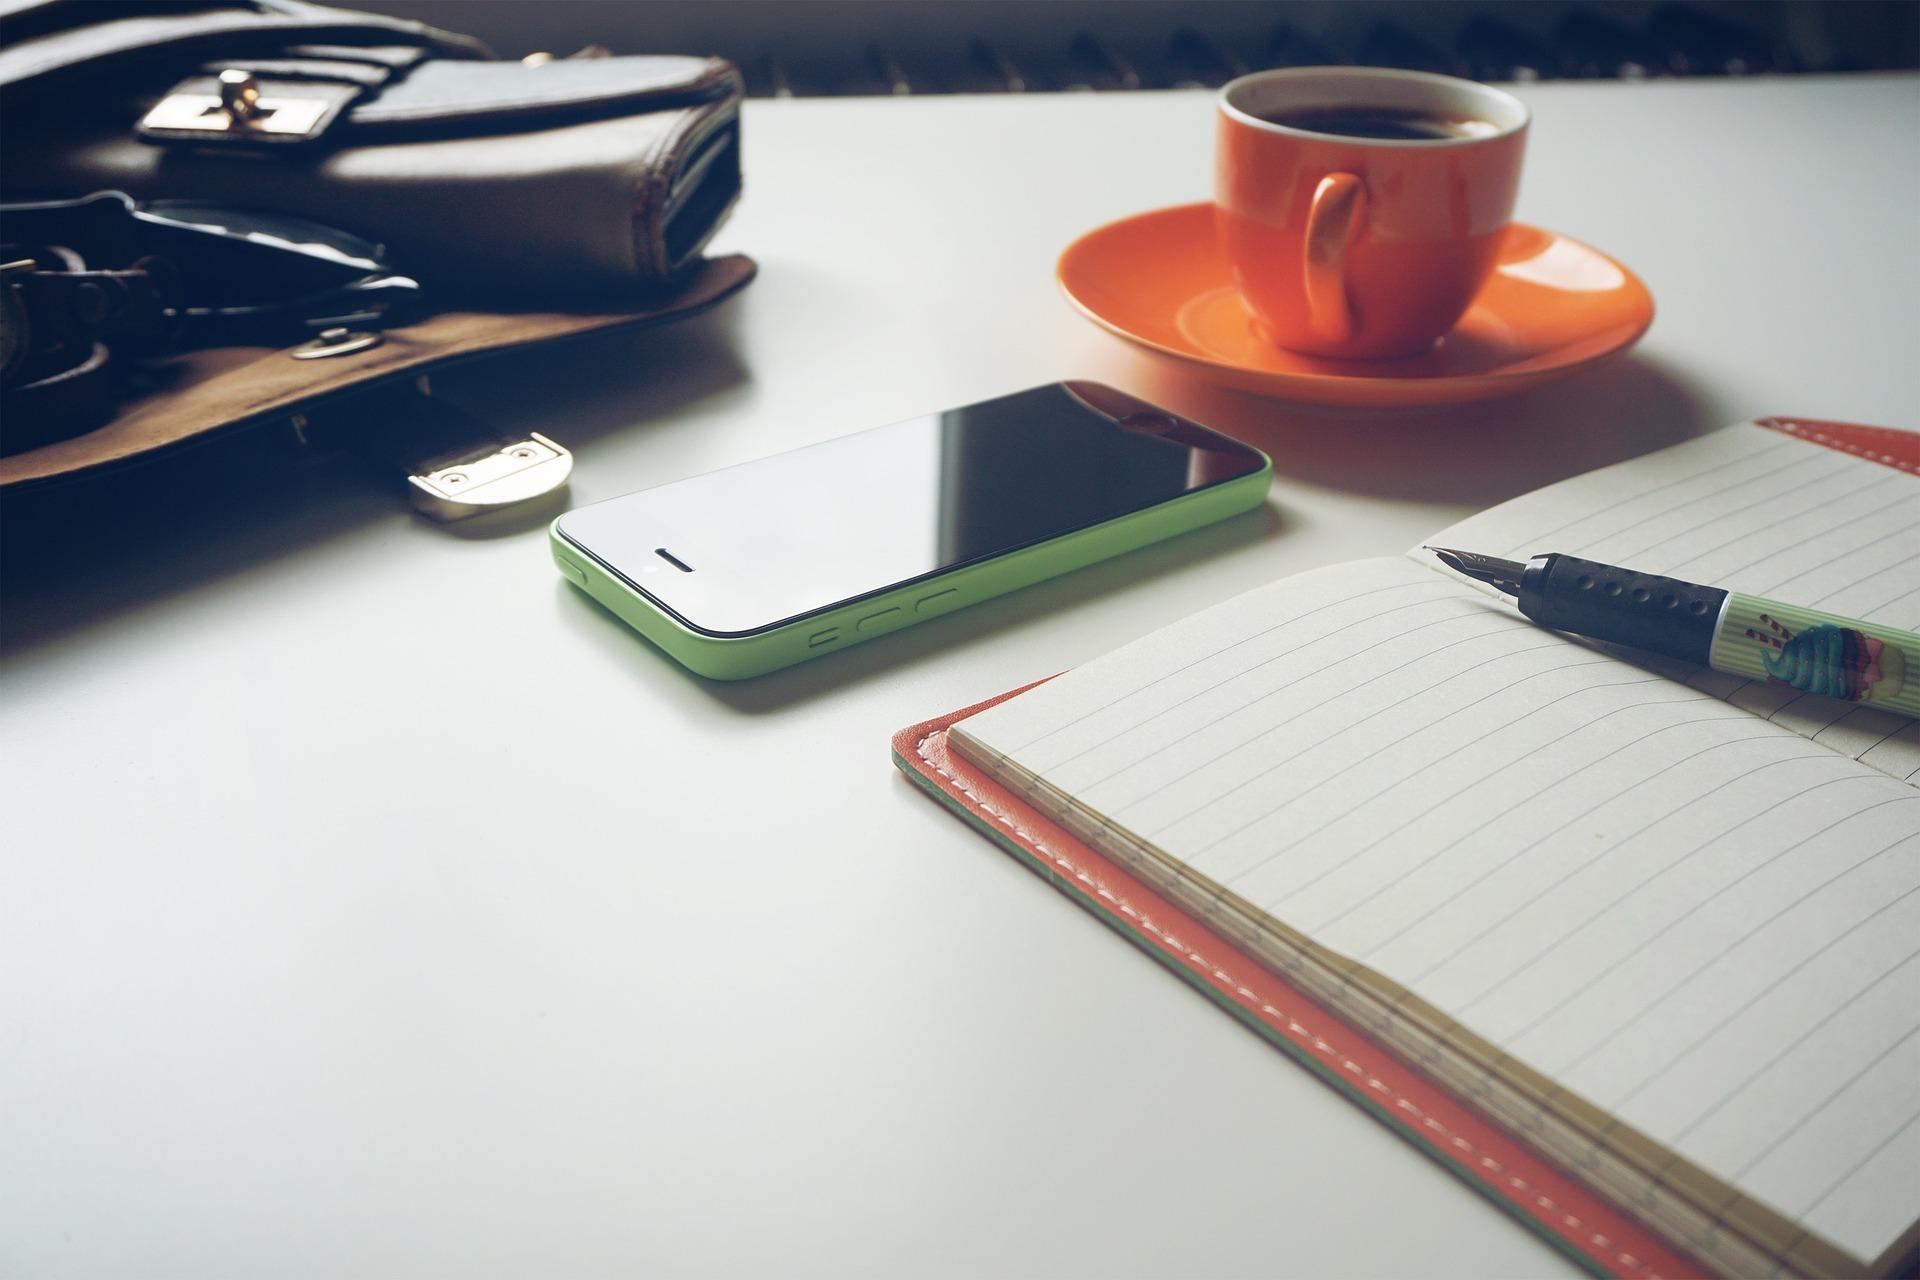 praca nad projektem - notatki, kawa, telefon